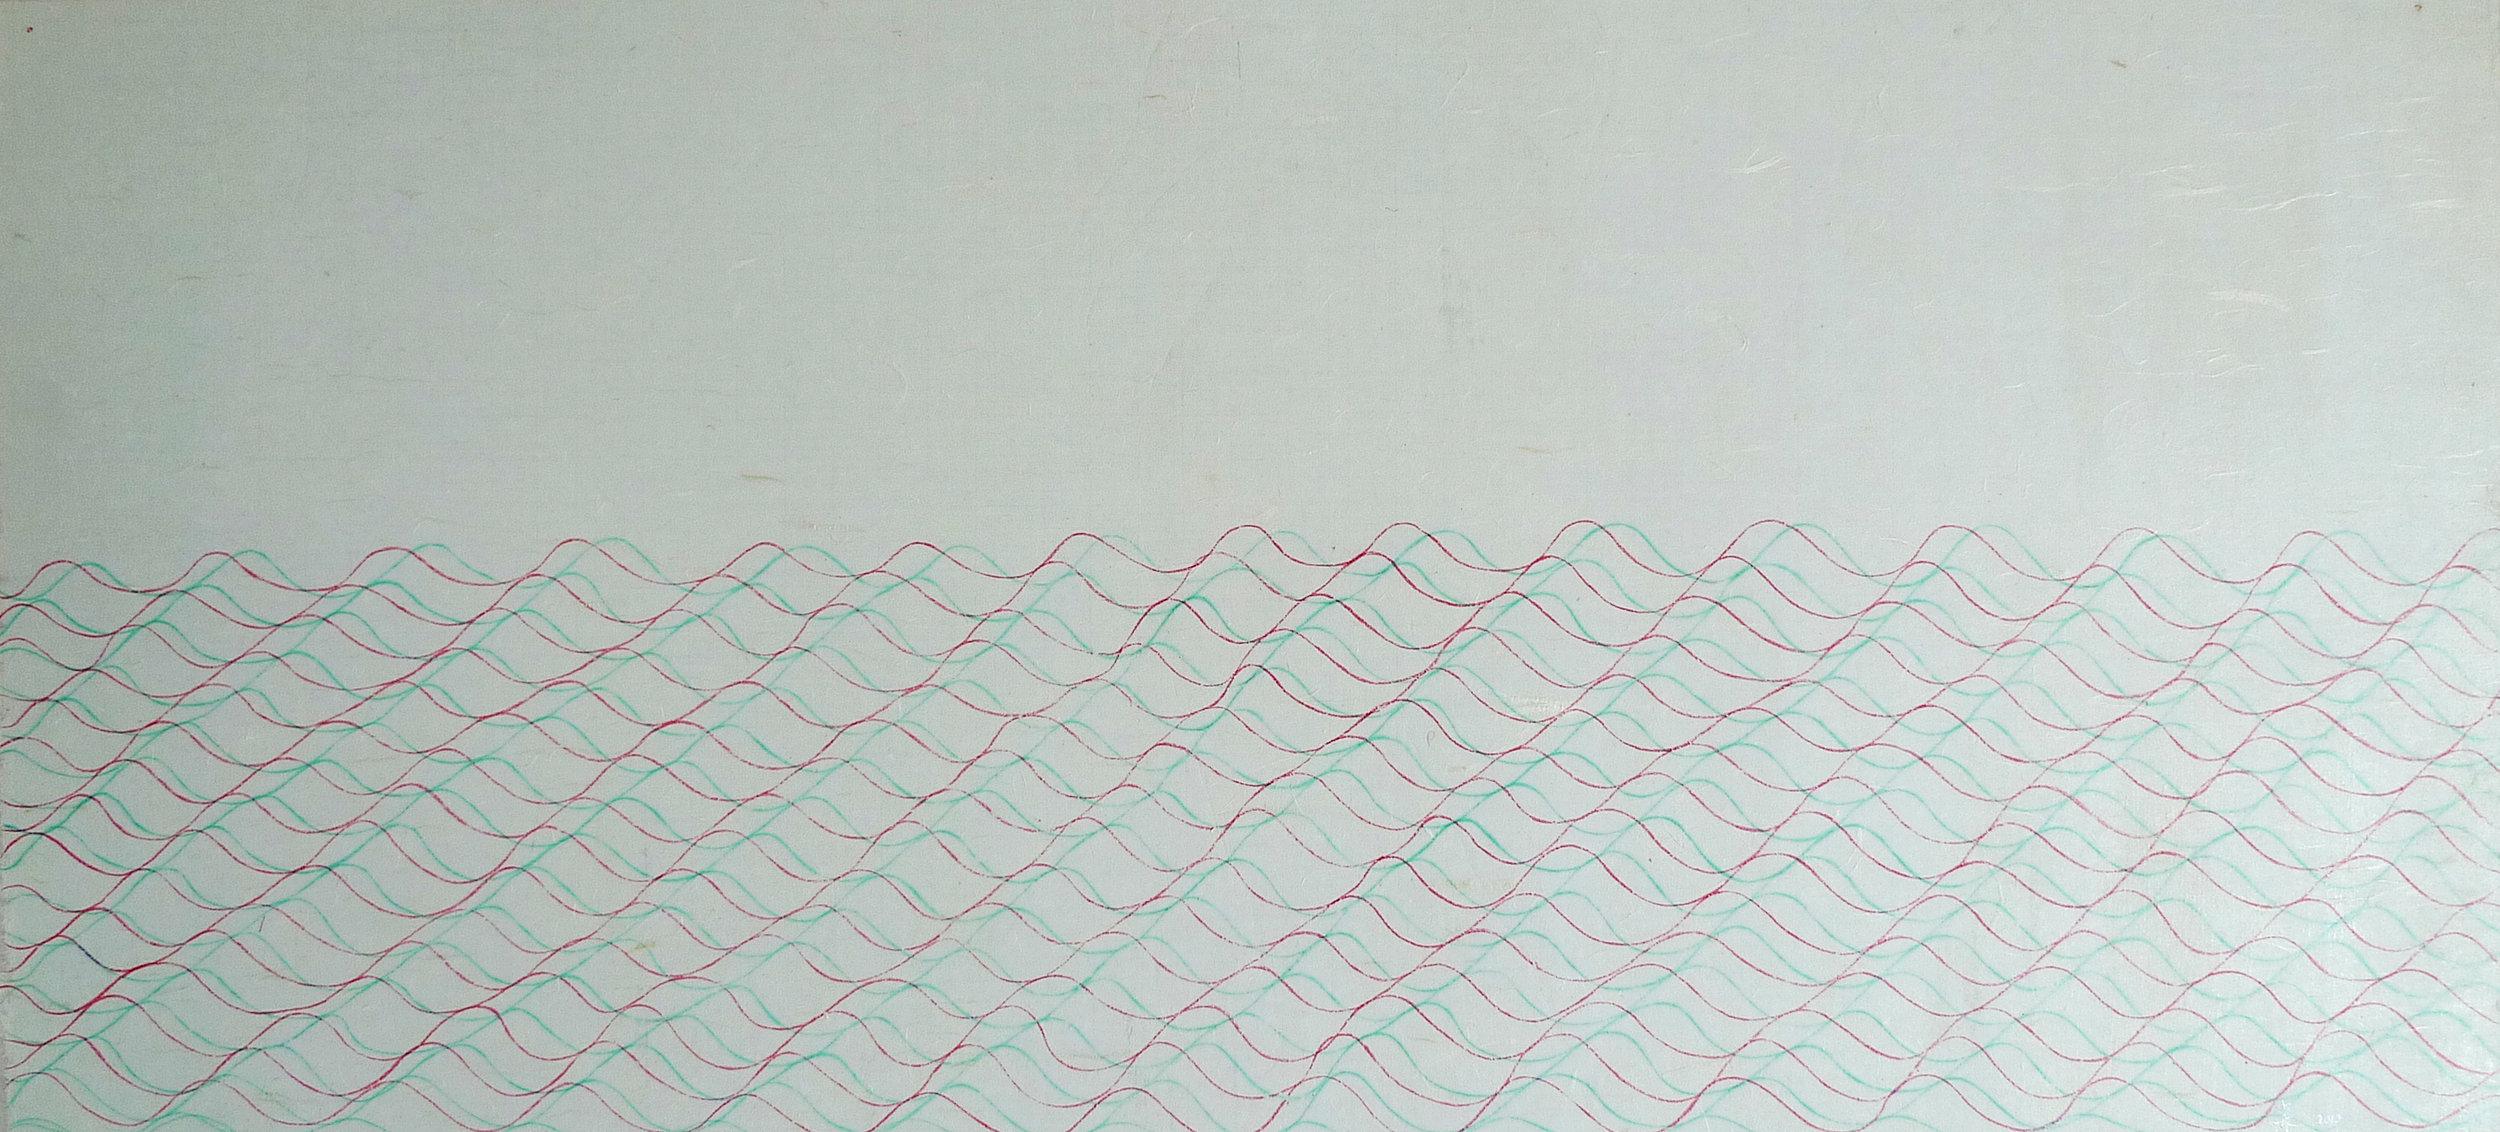 Zhou Jianjun 周建军, Untitled 无题, 2013, Ink on paper 纸本水墨设色, 45 x 97 cm